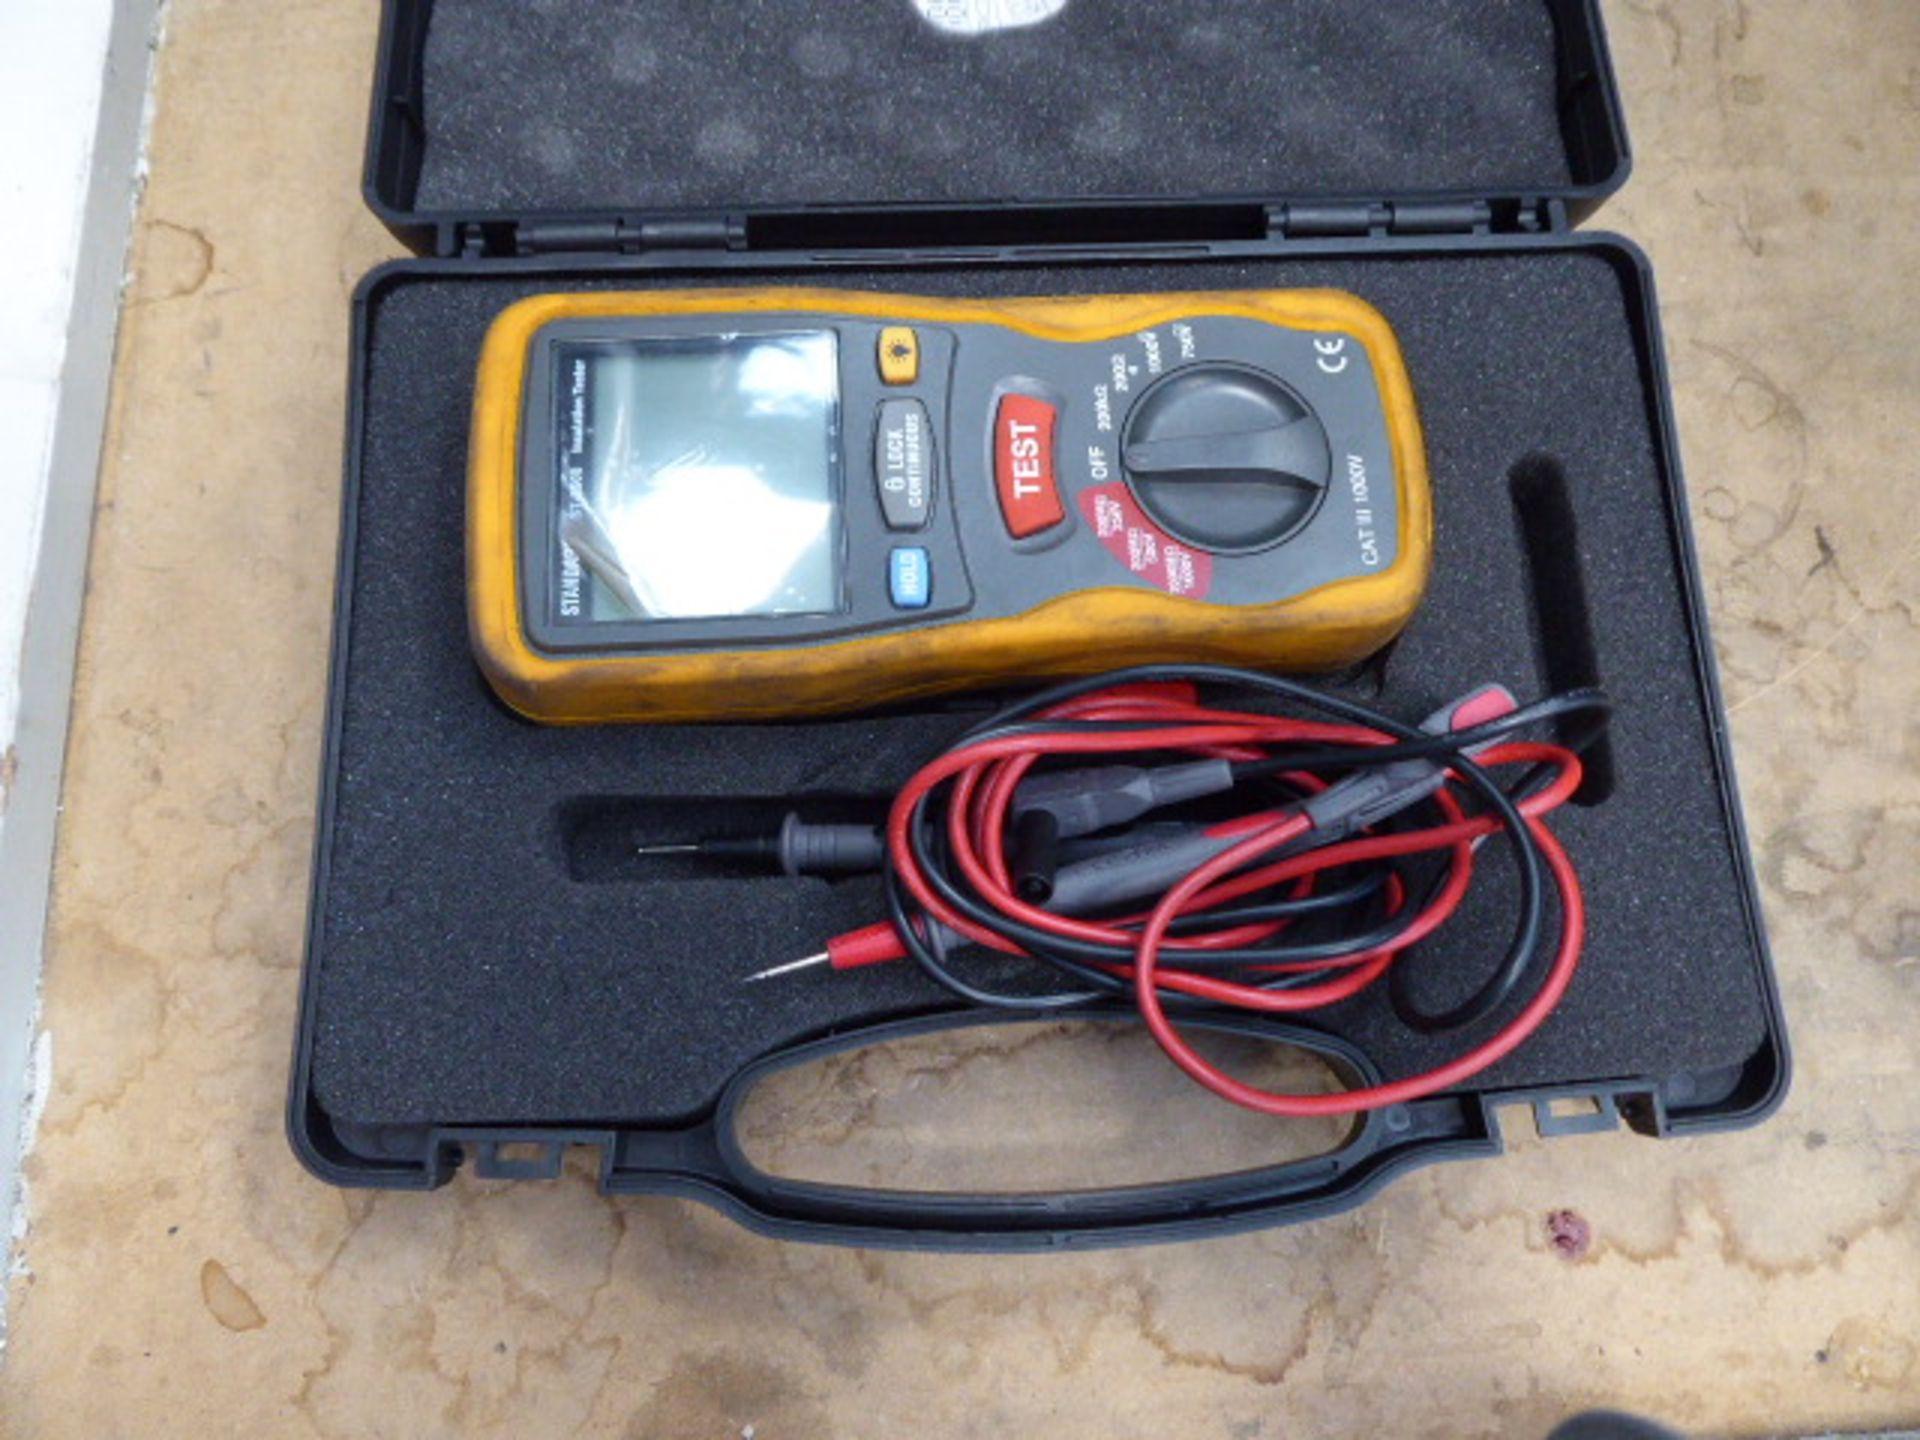 Digital instrument tester